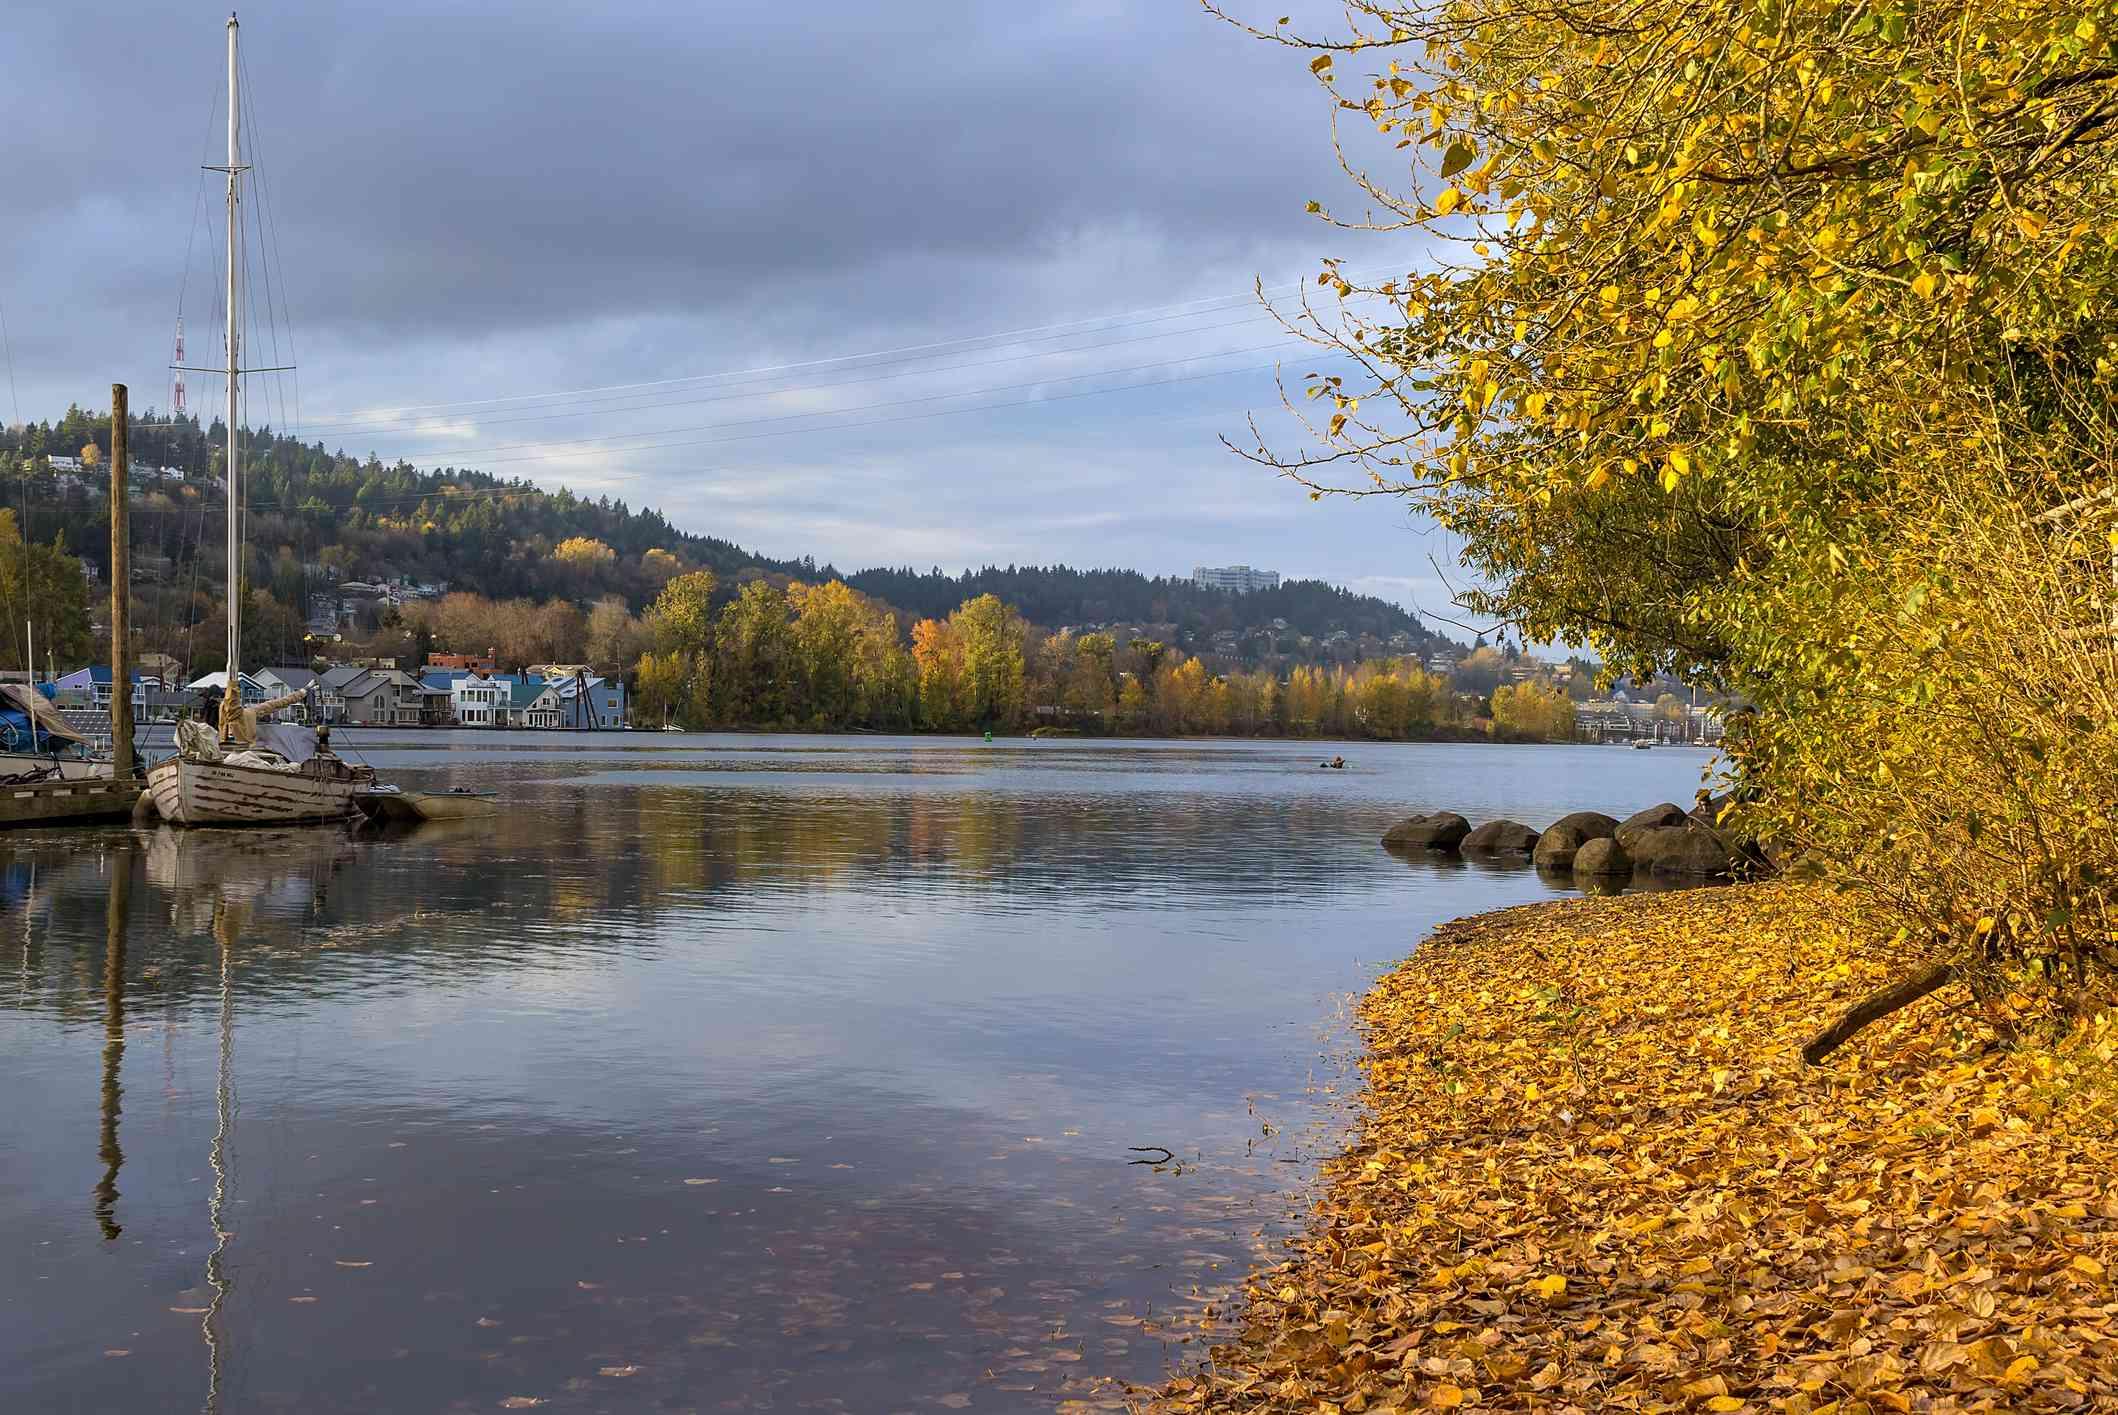 Marina along Willamette River at Sellwood Riverfront Park in Portland Oregon in fall season